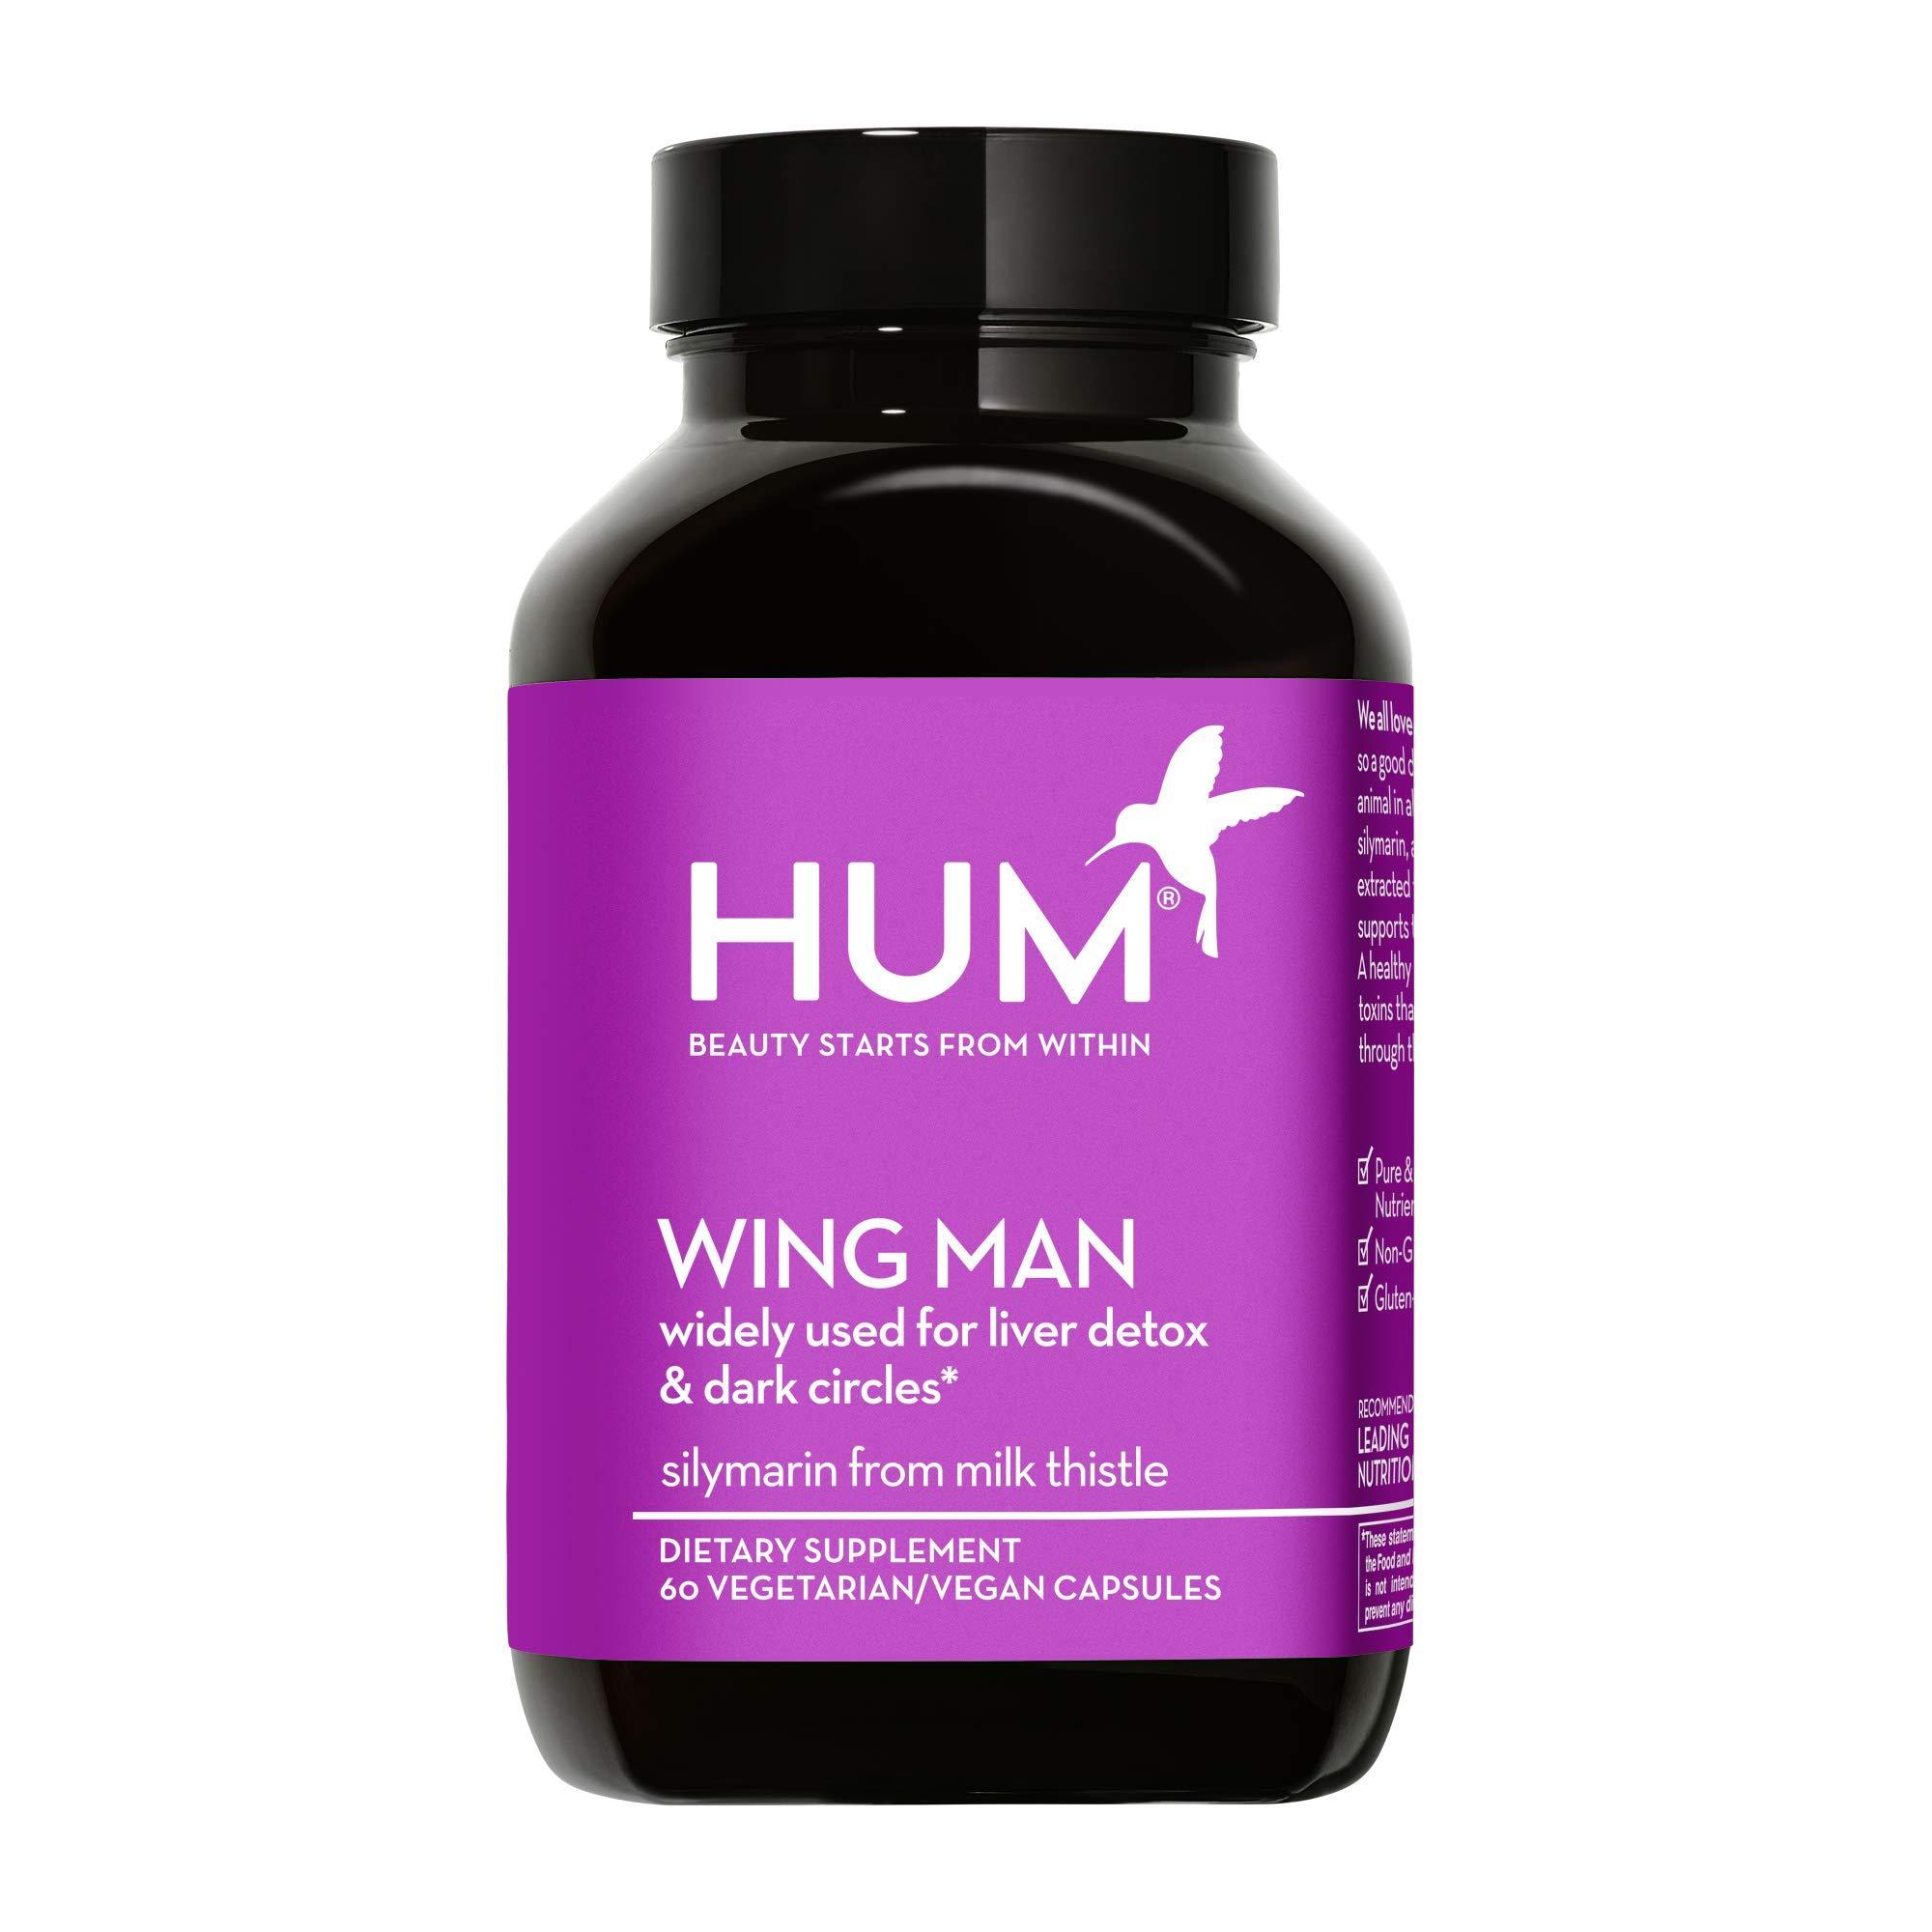 HUM Wing Man - Liver Detox Supplement - Silymarin Milk Thistle, Dandelion & Artichoke Leaf Support Skin Detox, Healthy Liver, & Cleanse Body of Toxins (60 Vegan Capsules)